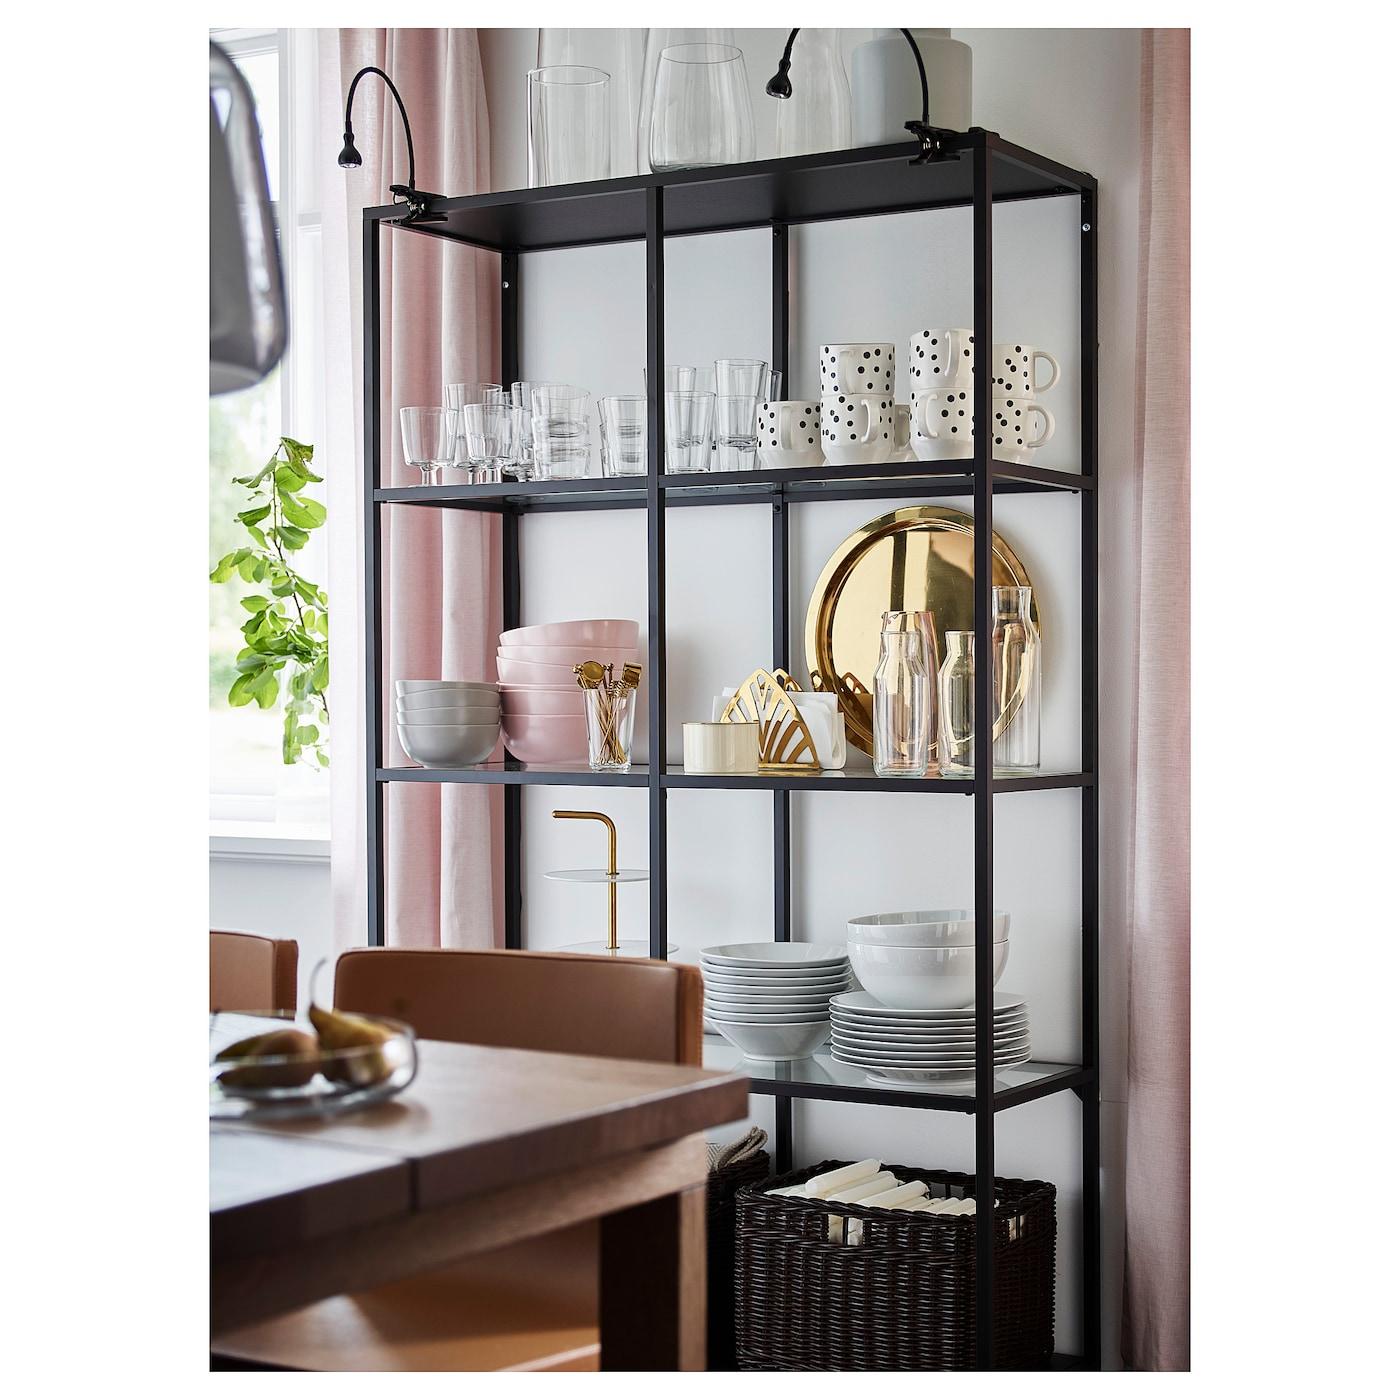 Stellingkast 25 Cm Diep.Vittsjo Stellingkast Zwartbruin Glas 100 X 175 Cm Ikea